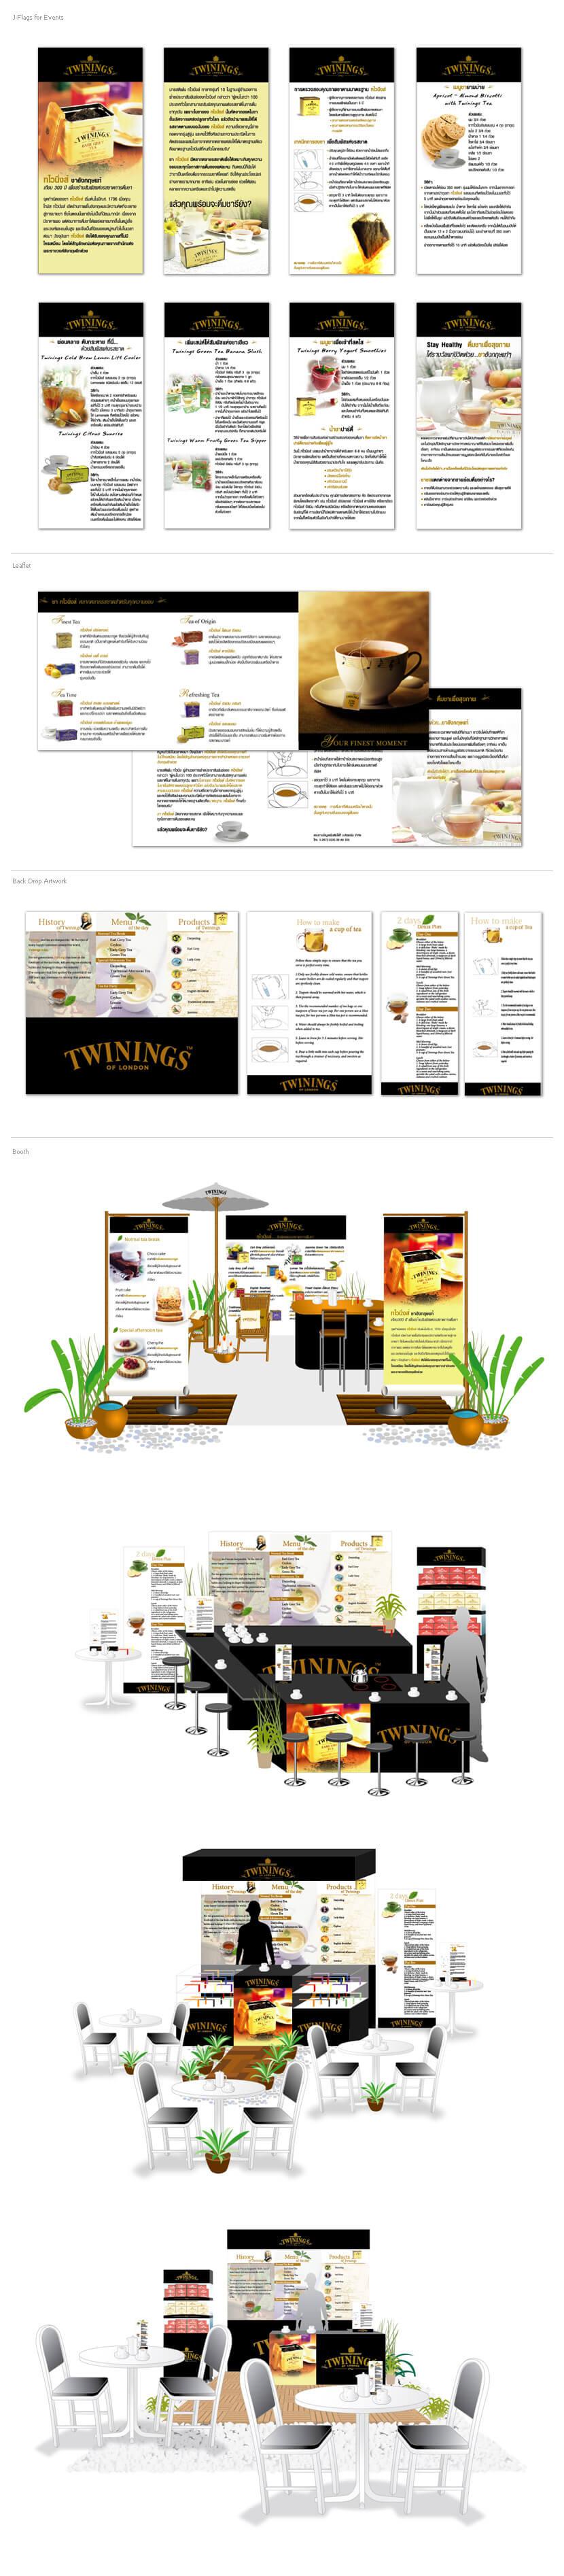 Print Design - Twinings